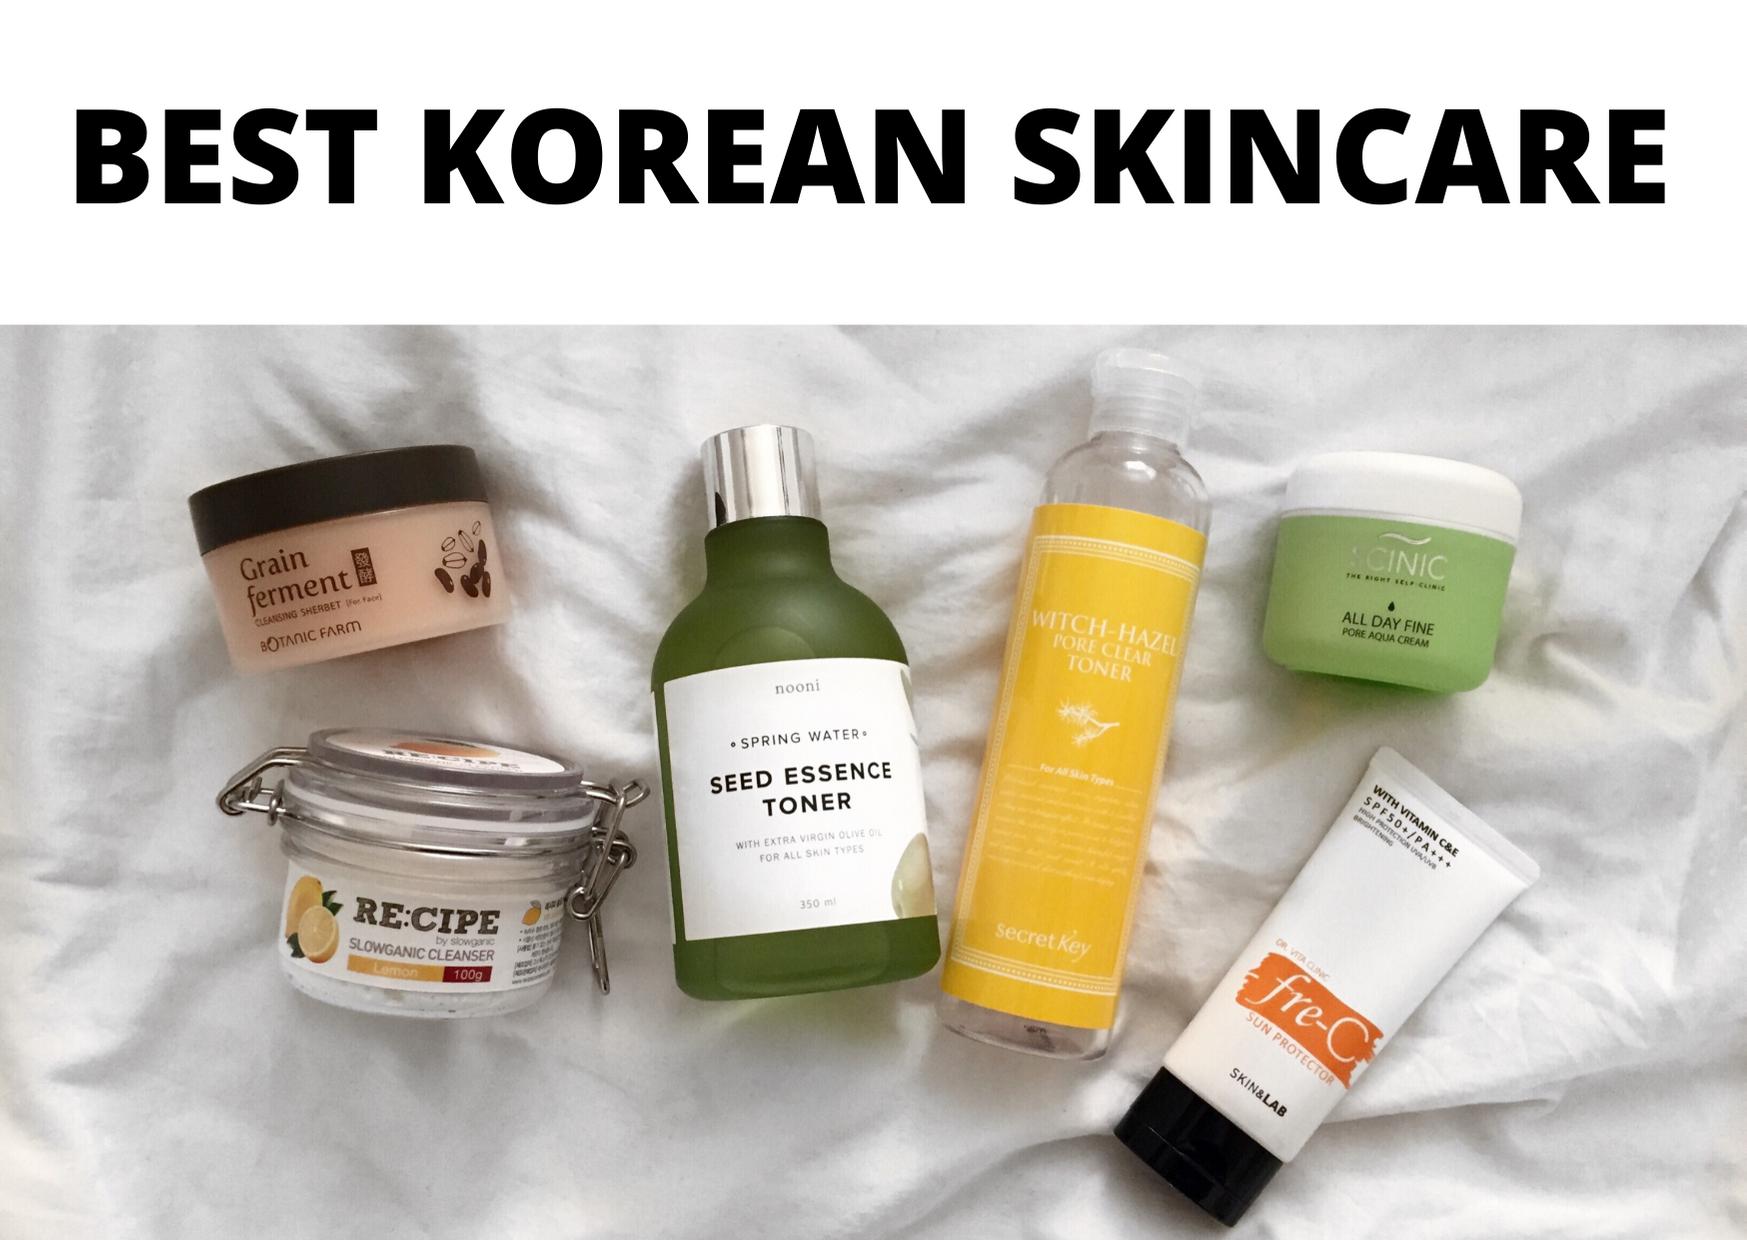 Latest Update July 2016 Etude House Wonder Pore Tightening Essence Is A Lightweight Serum Healthy Skin Cream Oily Skin Care Korean Skincare Routine